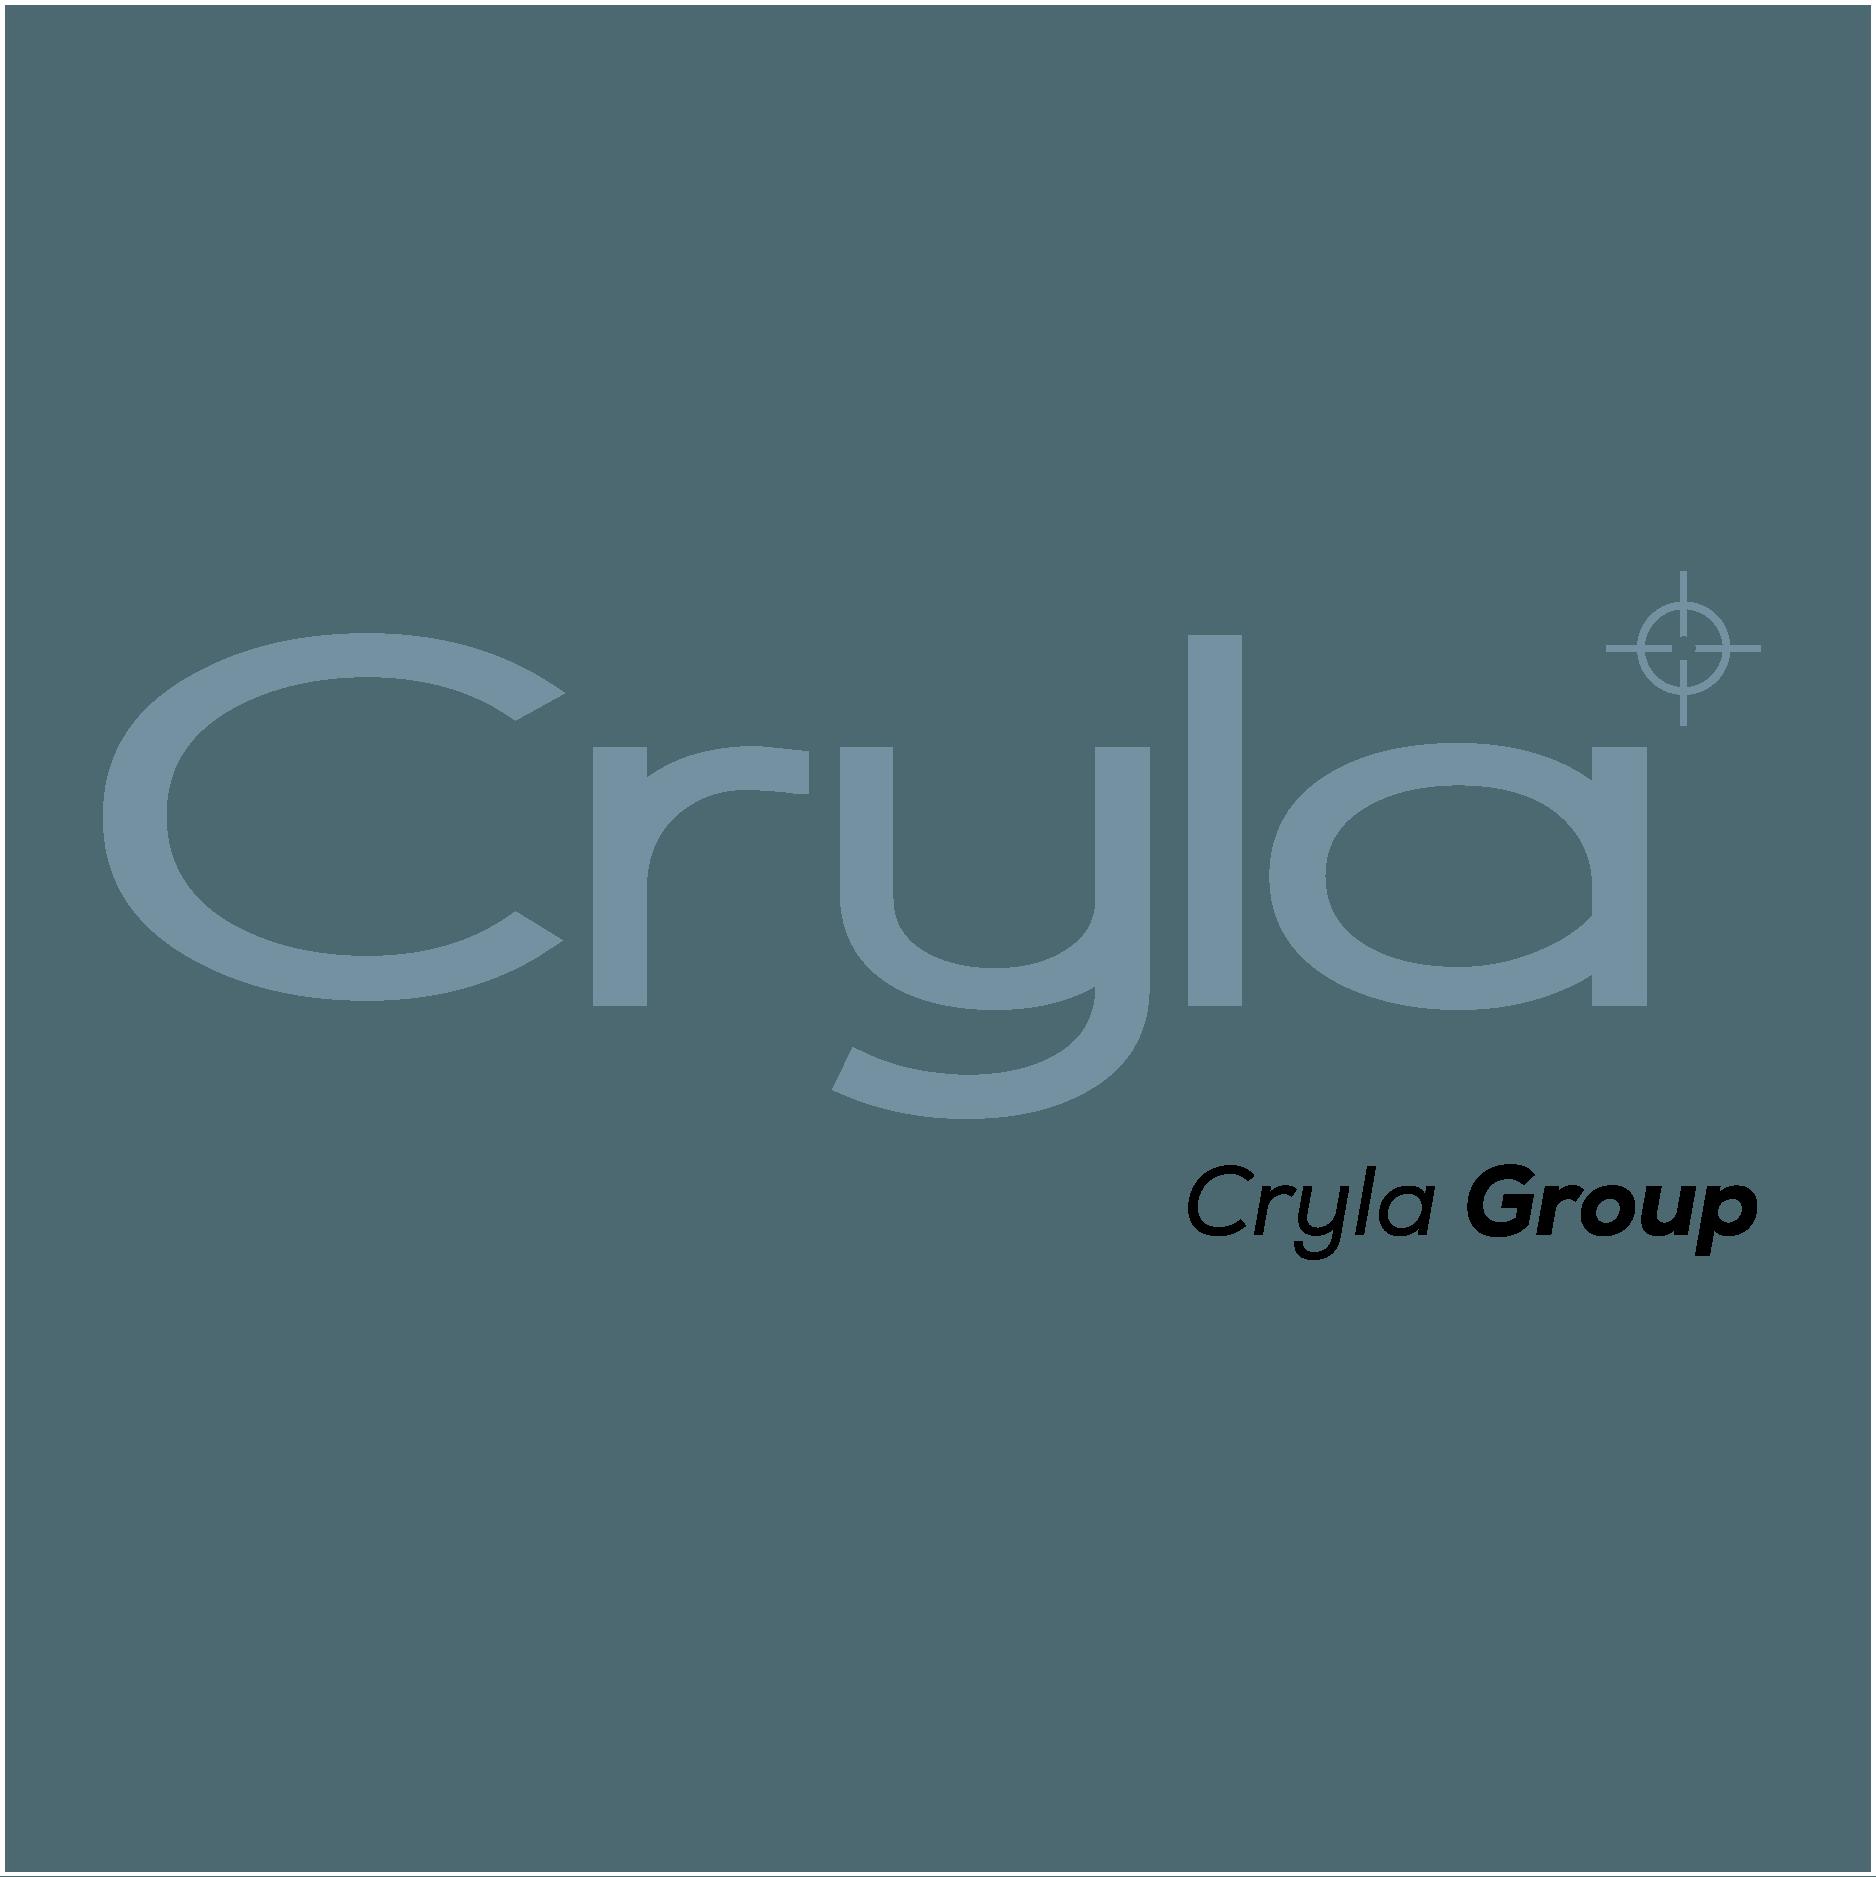 Logo Cryla Filiale de Cryla Group à Besançon